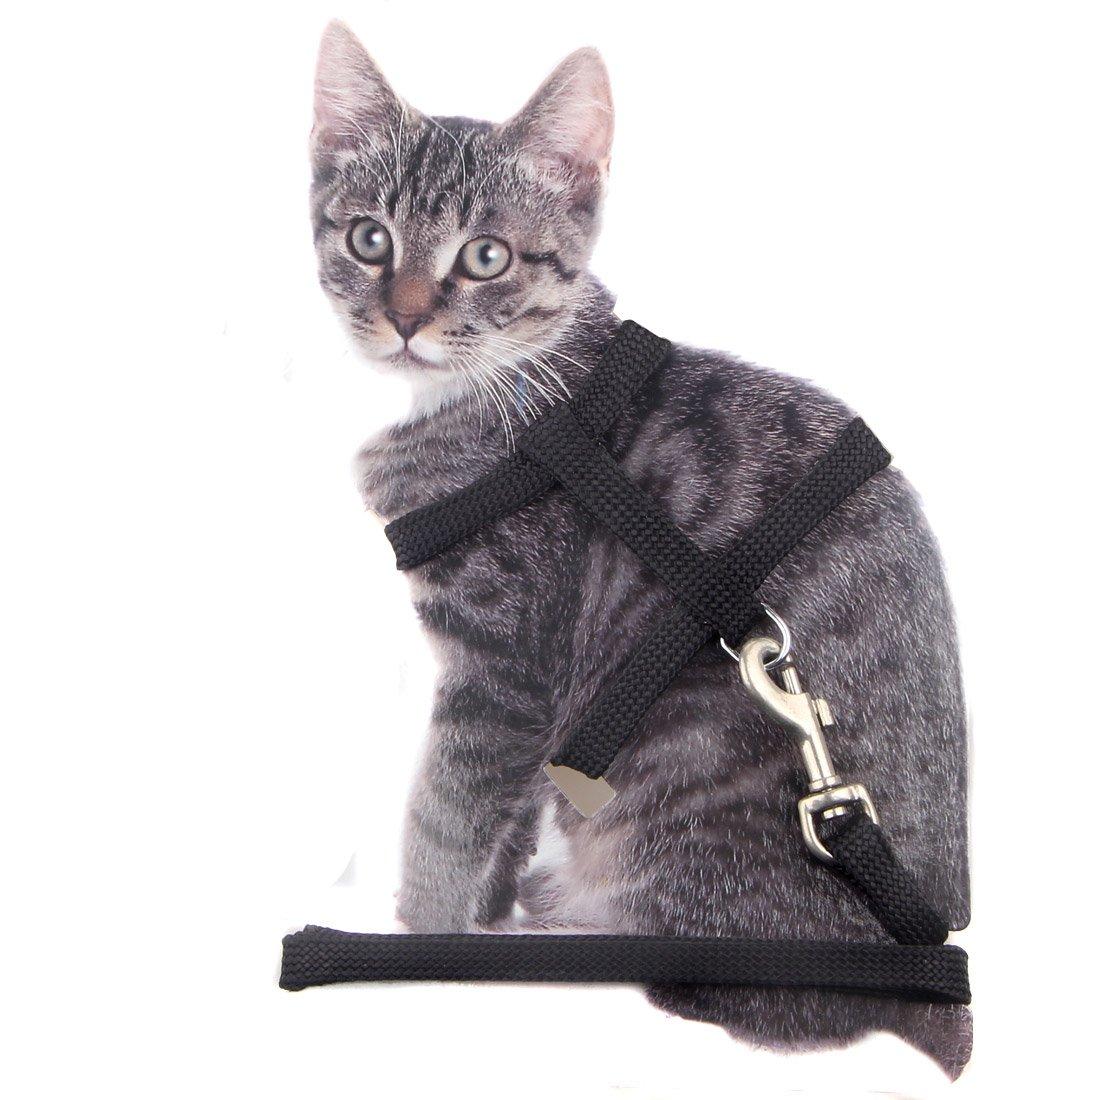 Cat Harness and Leash Adjustable Nylon Halter Kitten Nylon Strap Belt Safety